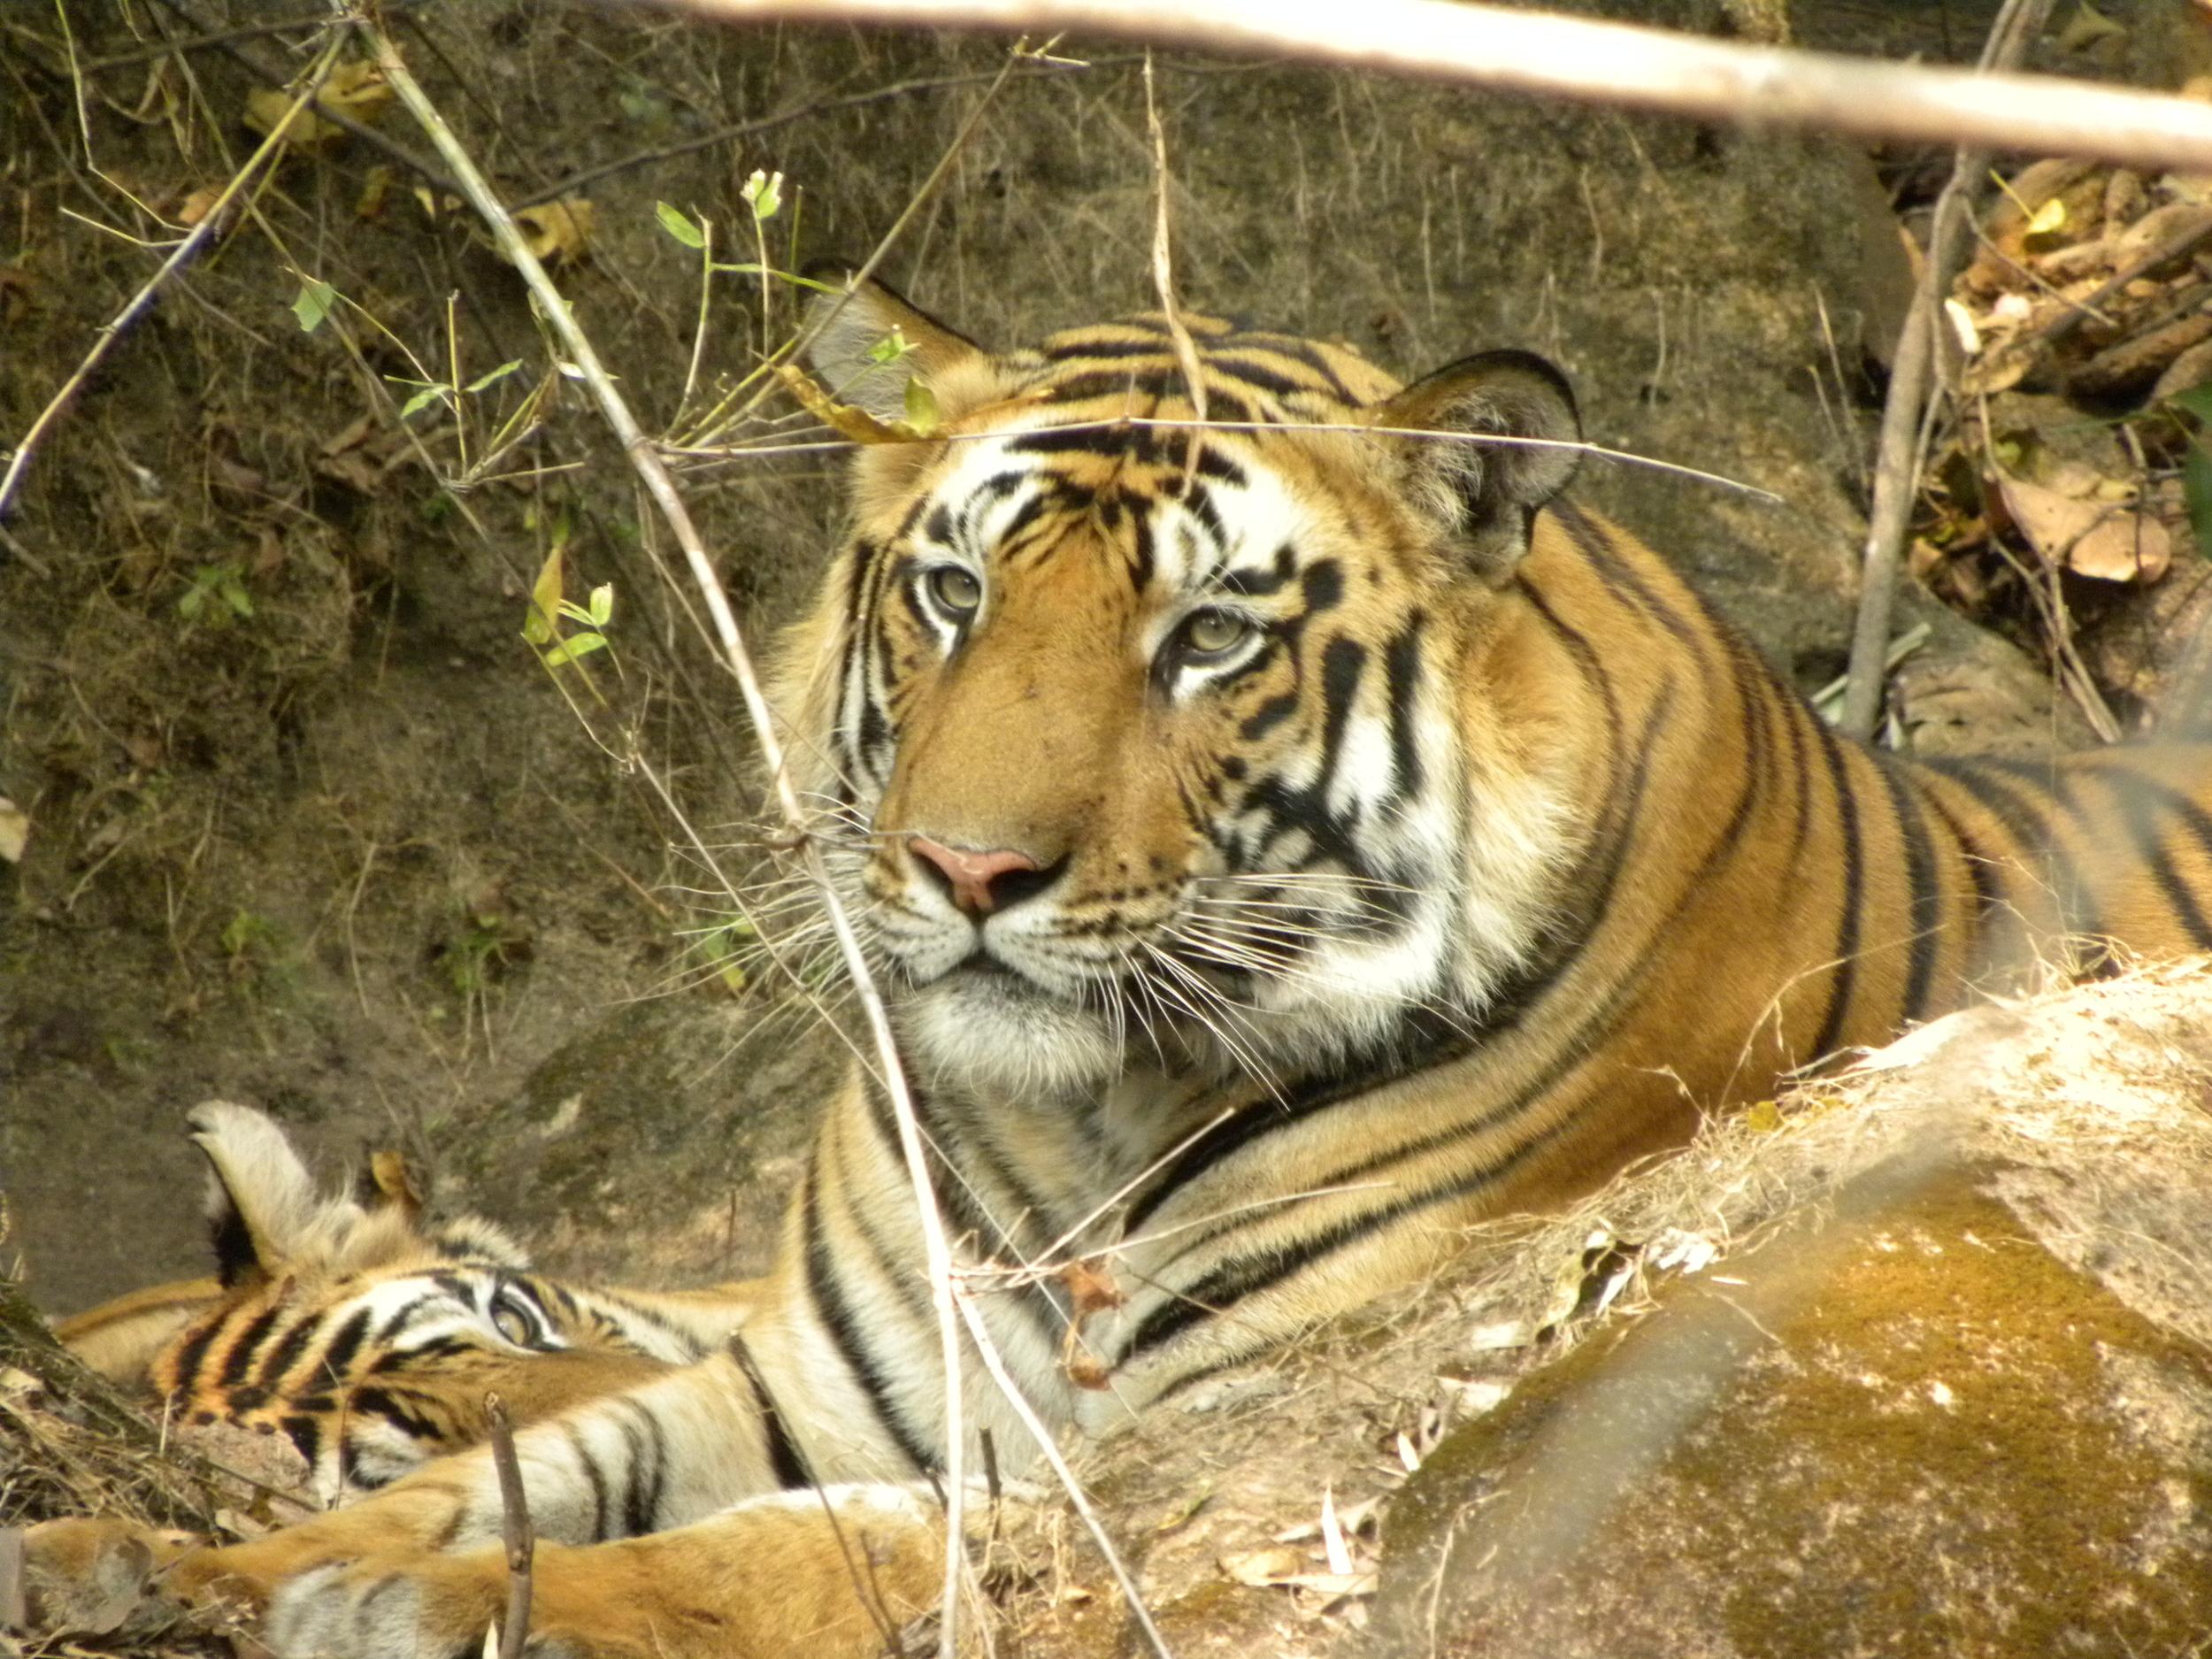 An Indian tiger  (photo by Priya Davidar)